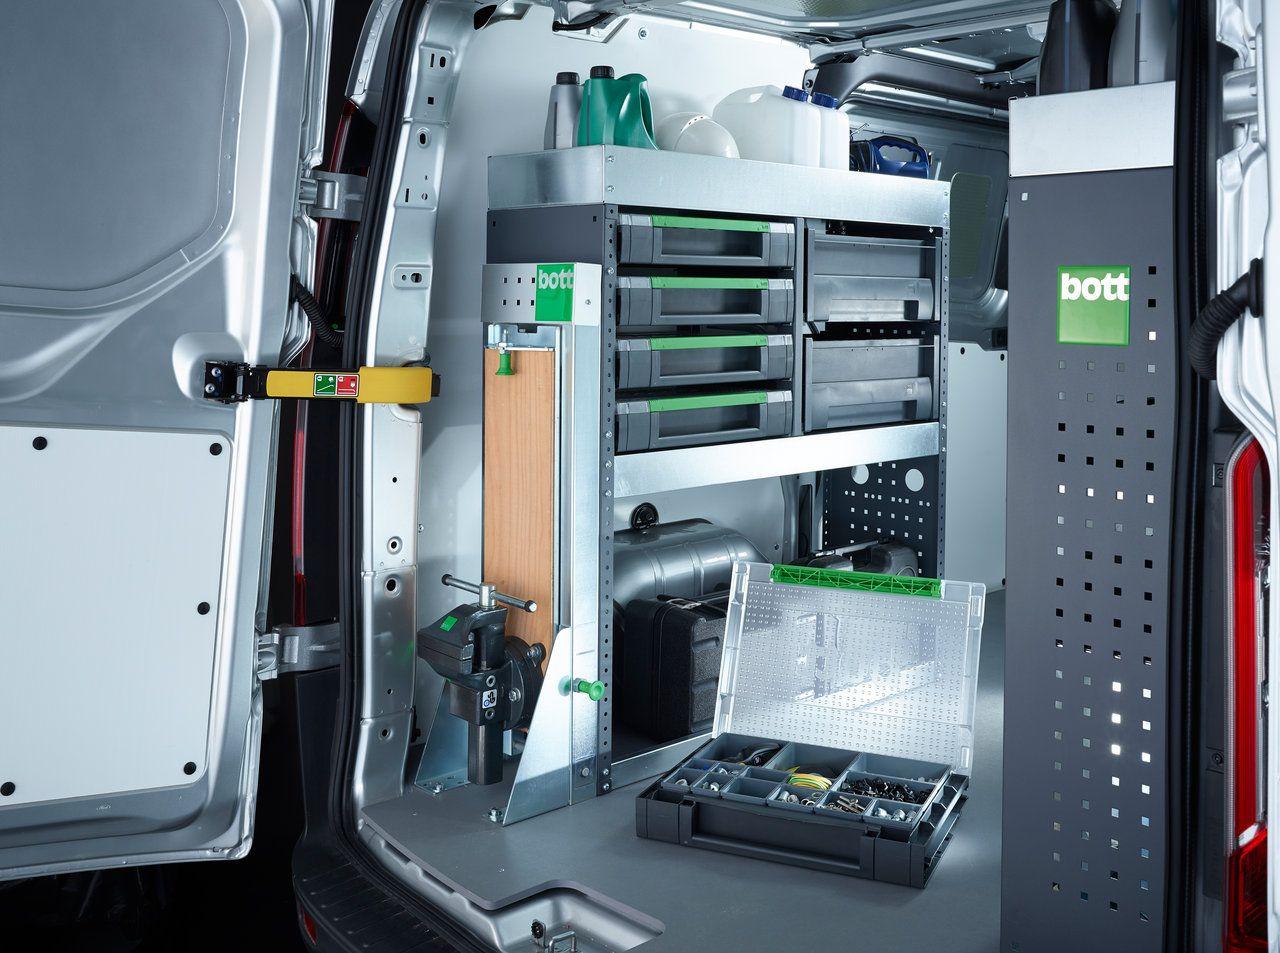 Bott van storage best storage design 2017 for Innovative hvac systems